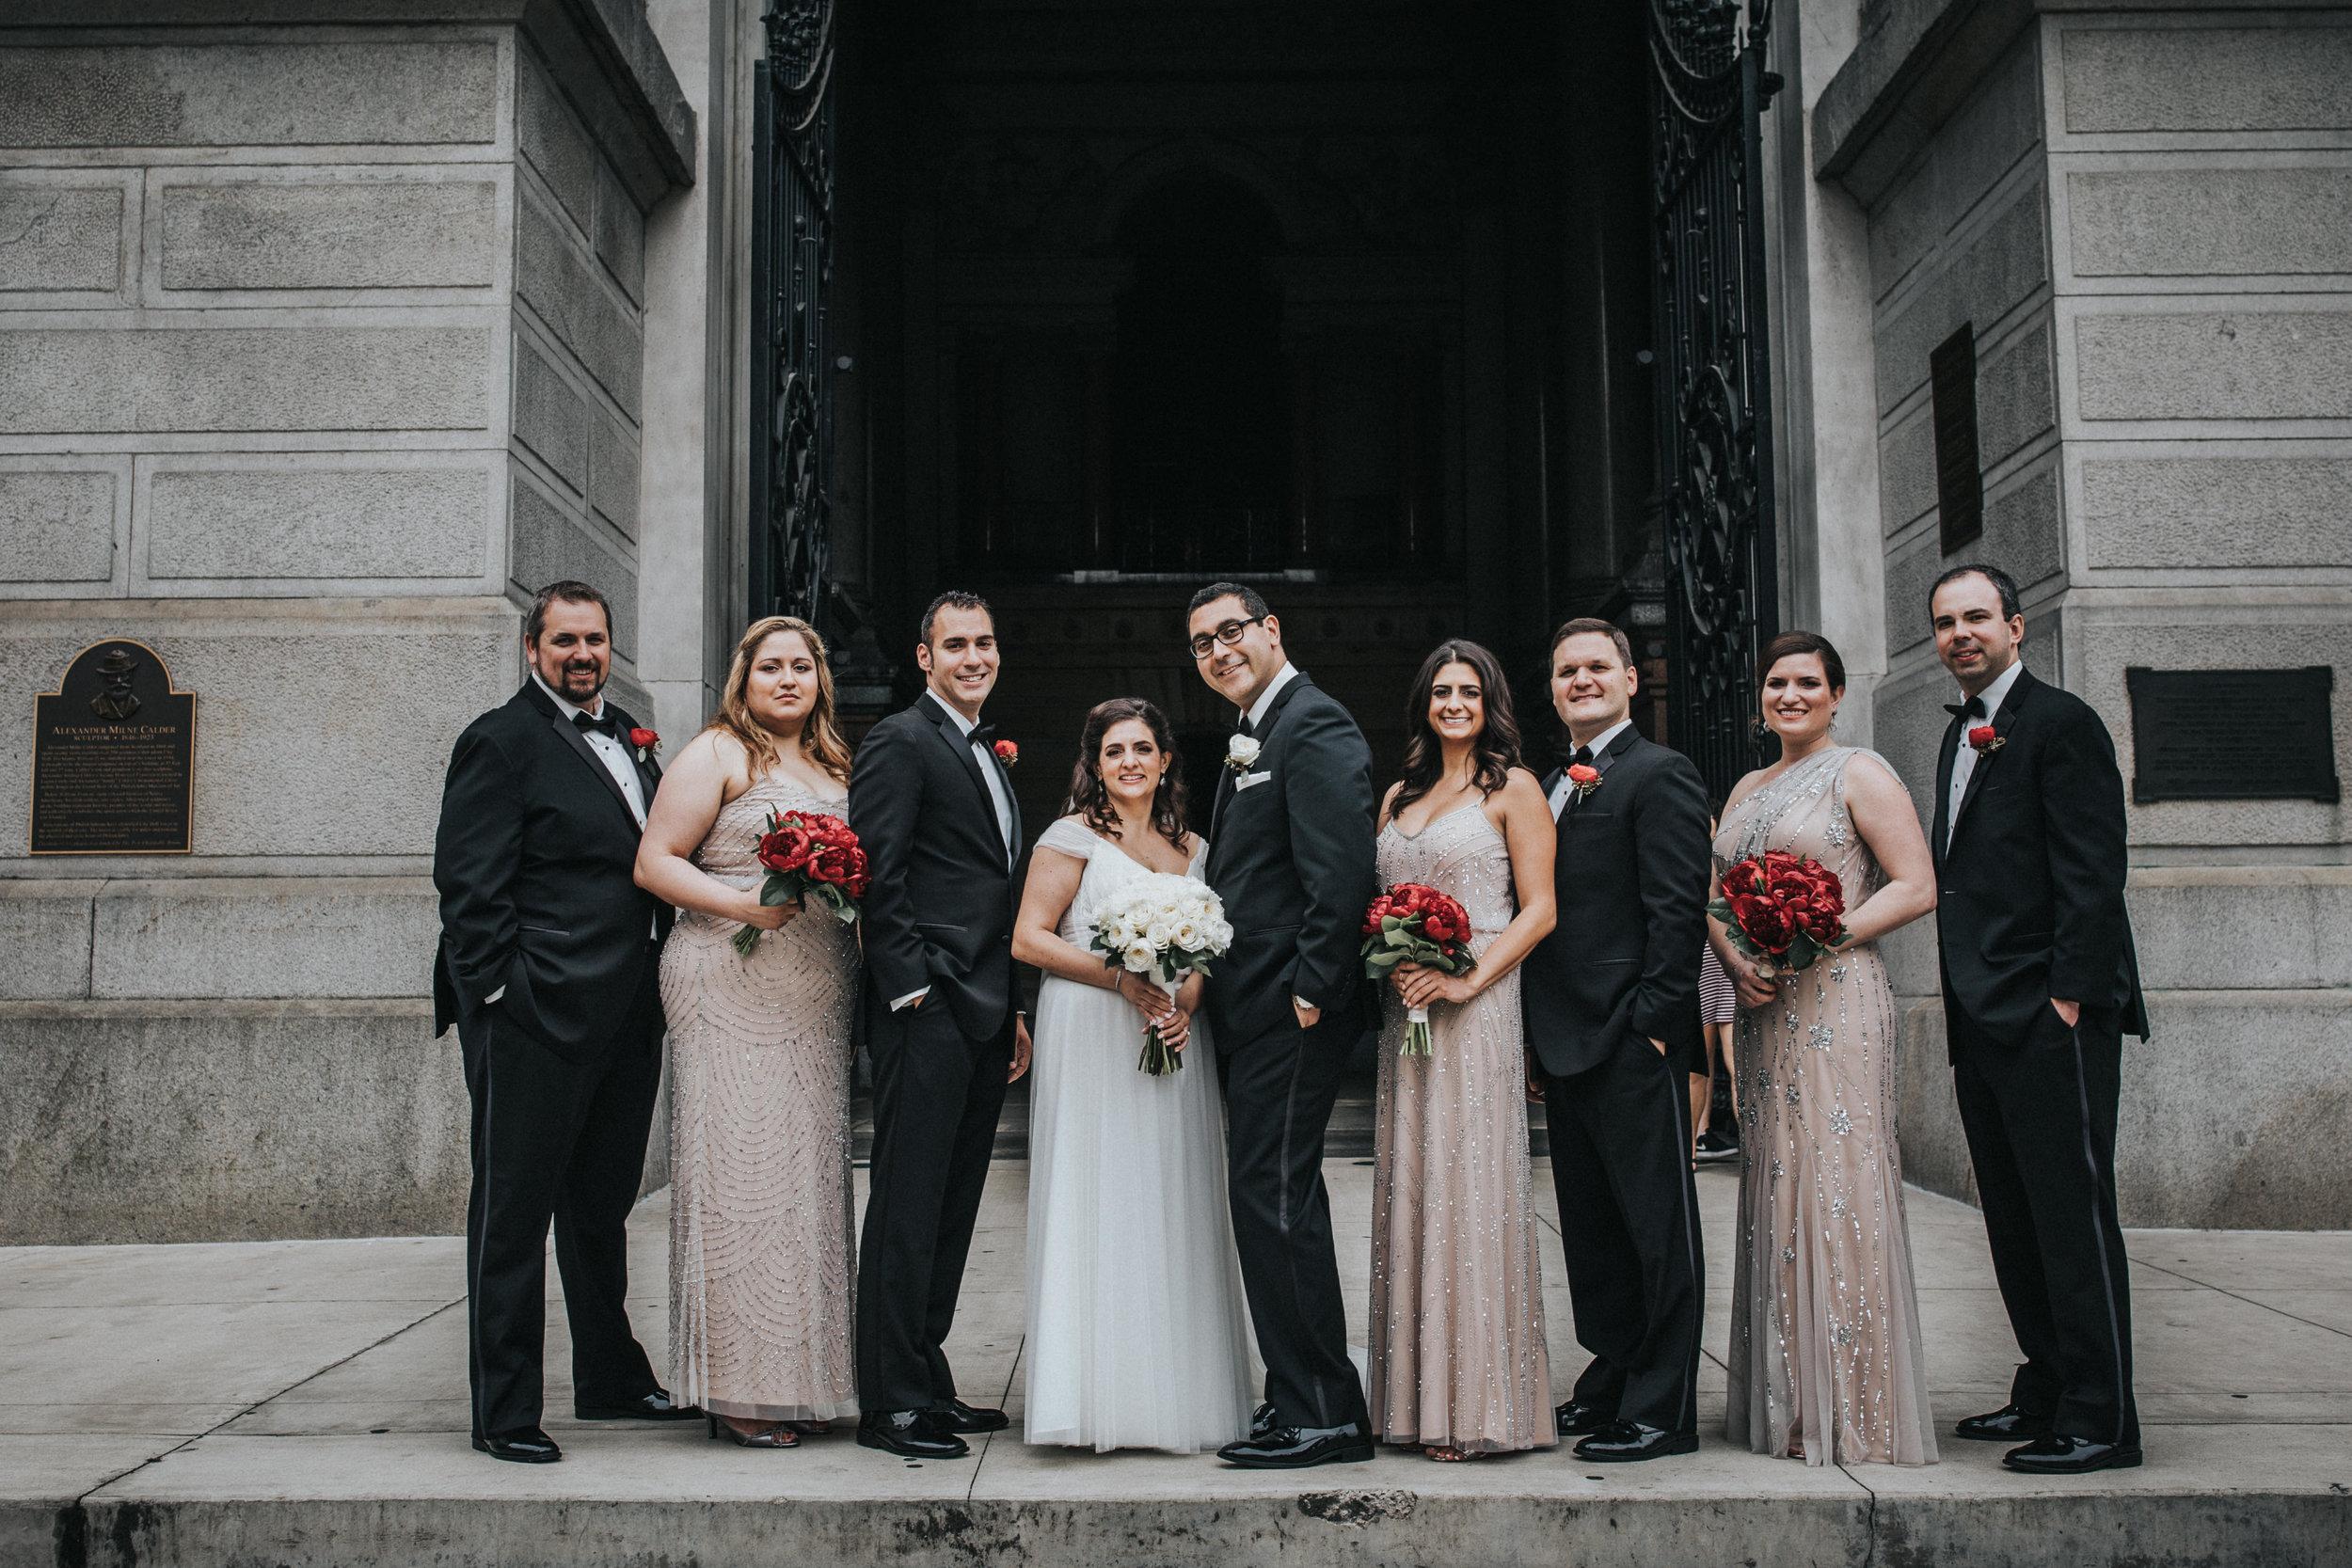 JennaLynnPhotography-NJWeddingPhotographer-Philadelphia-Wedding-ArtsBallroom-BridalParty-3.jpg